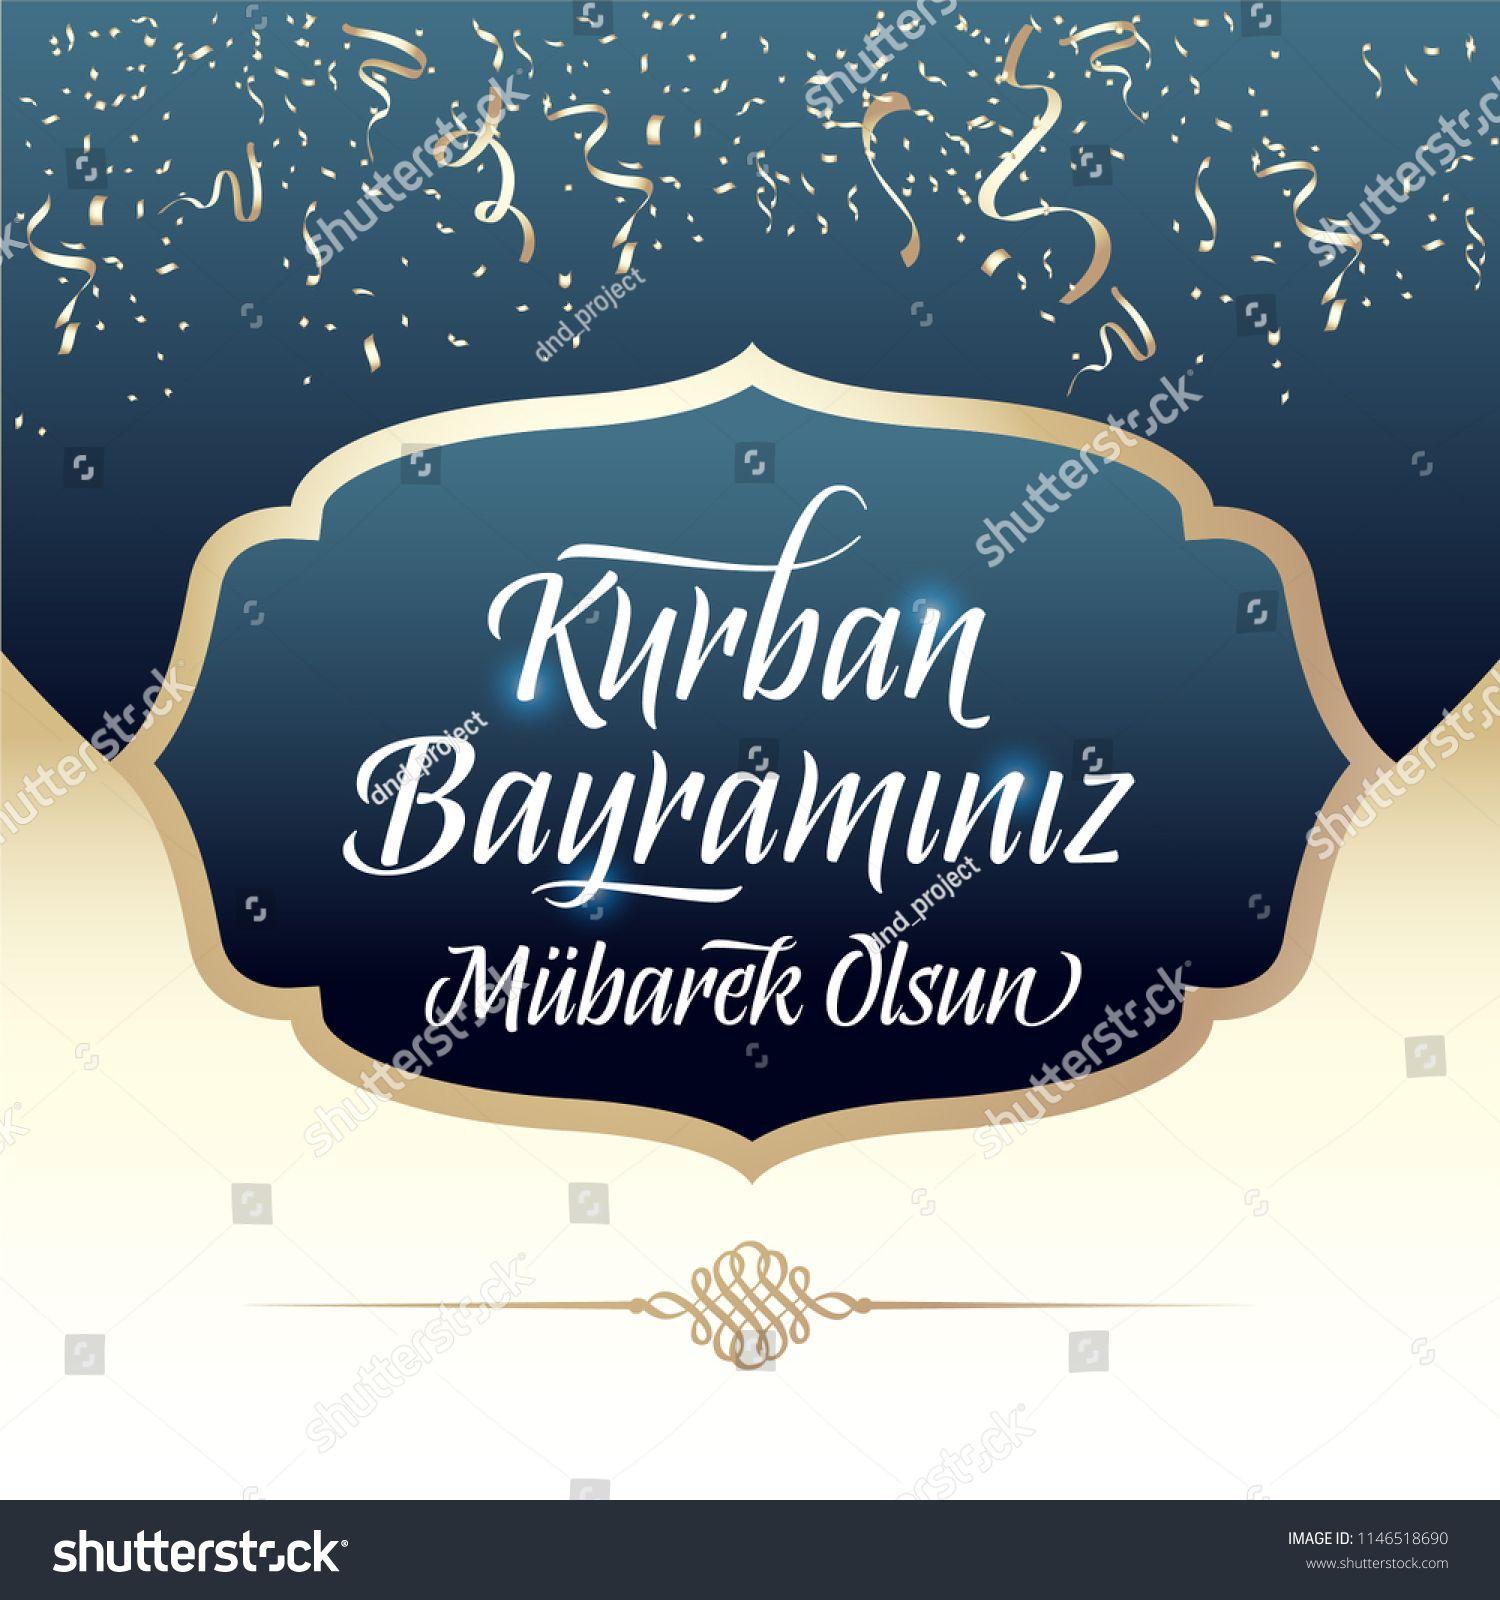 Feast Of The Sacrif Eid Al Adha Mubarak Feast Of The Sacrifice Greeting Turkish Kurban Bayraminiz Mubarek Olsu Chalkboard Quote Art Modern Fonts Art Quotes